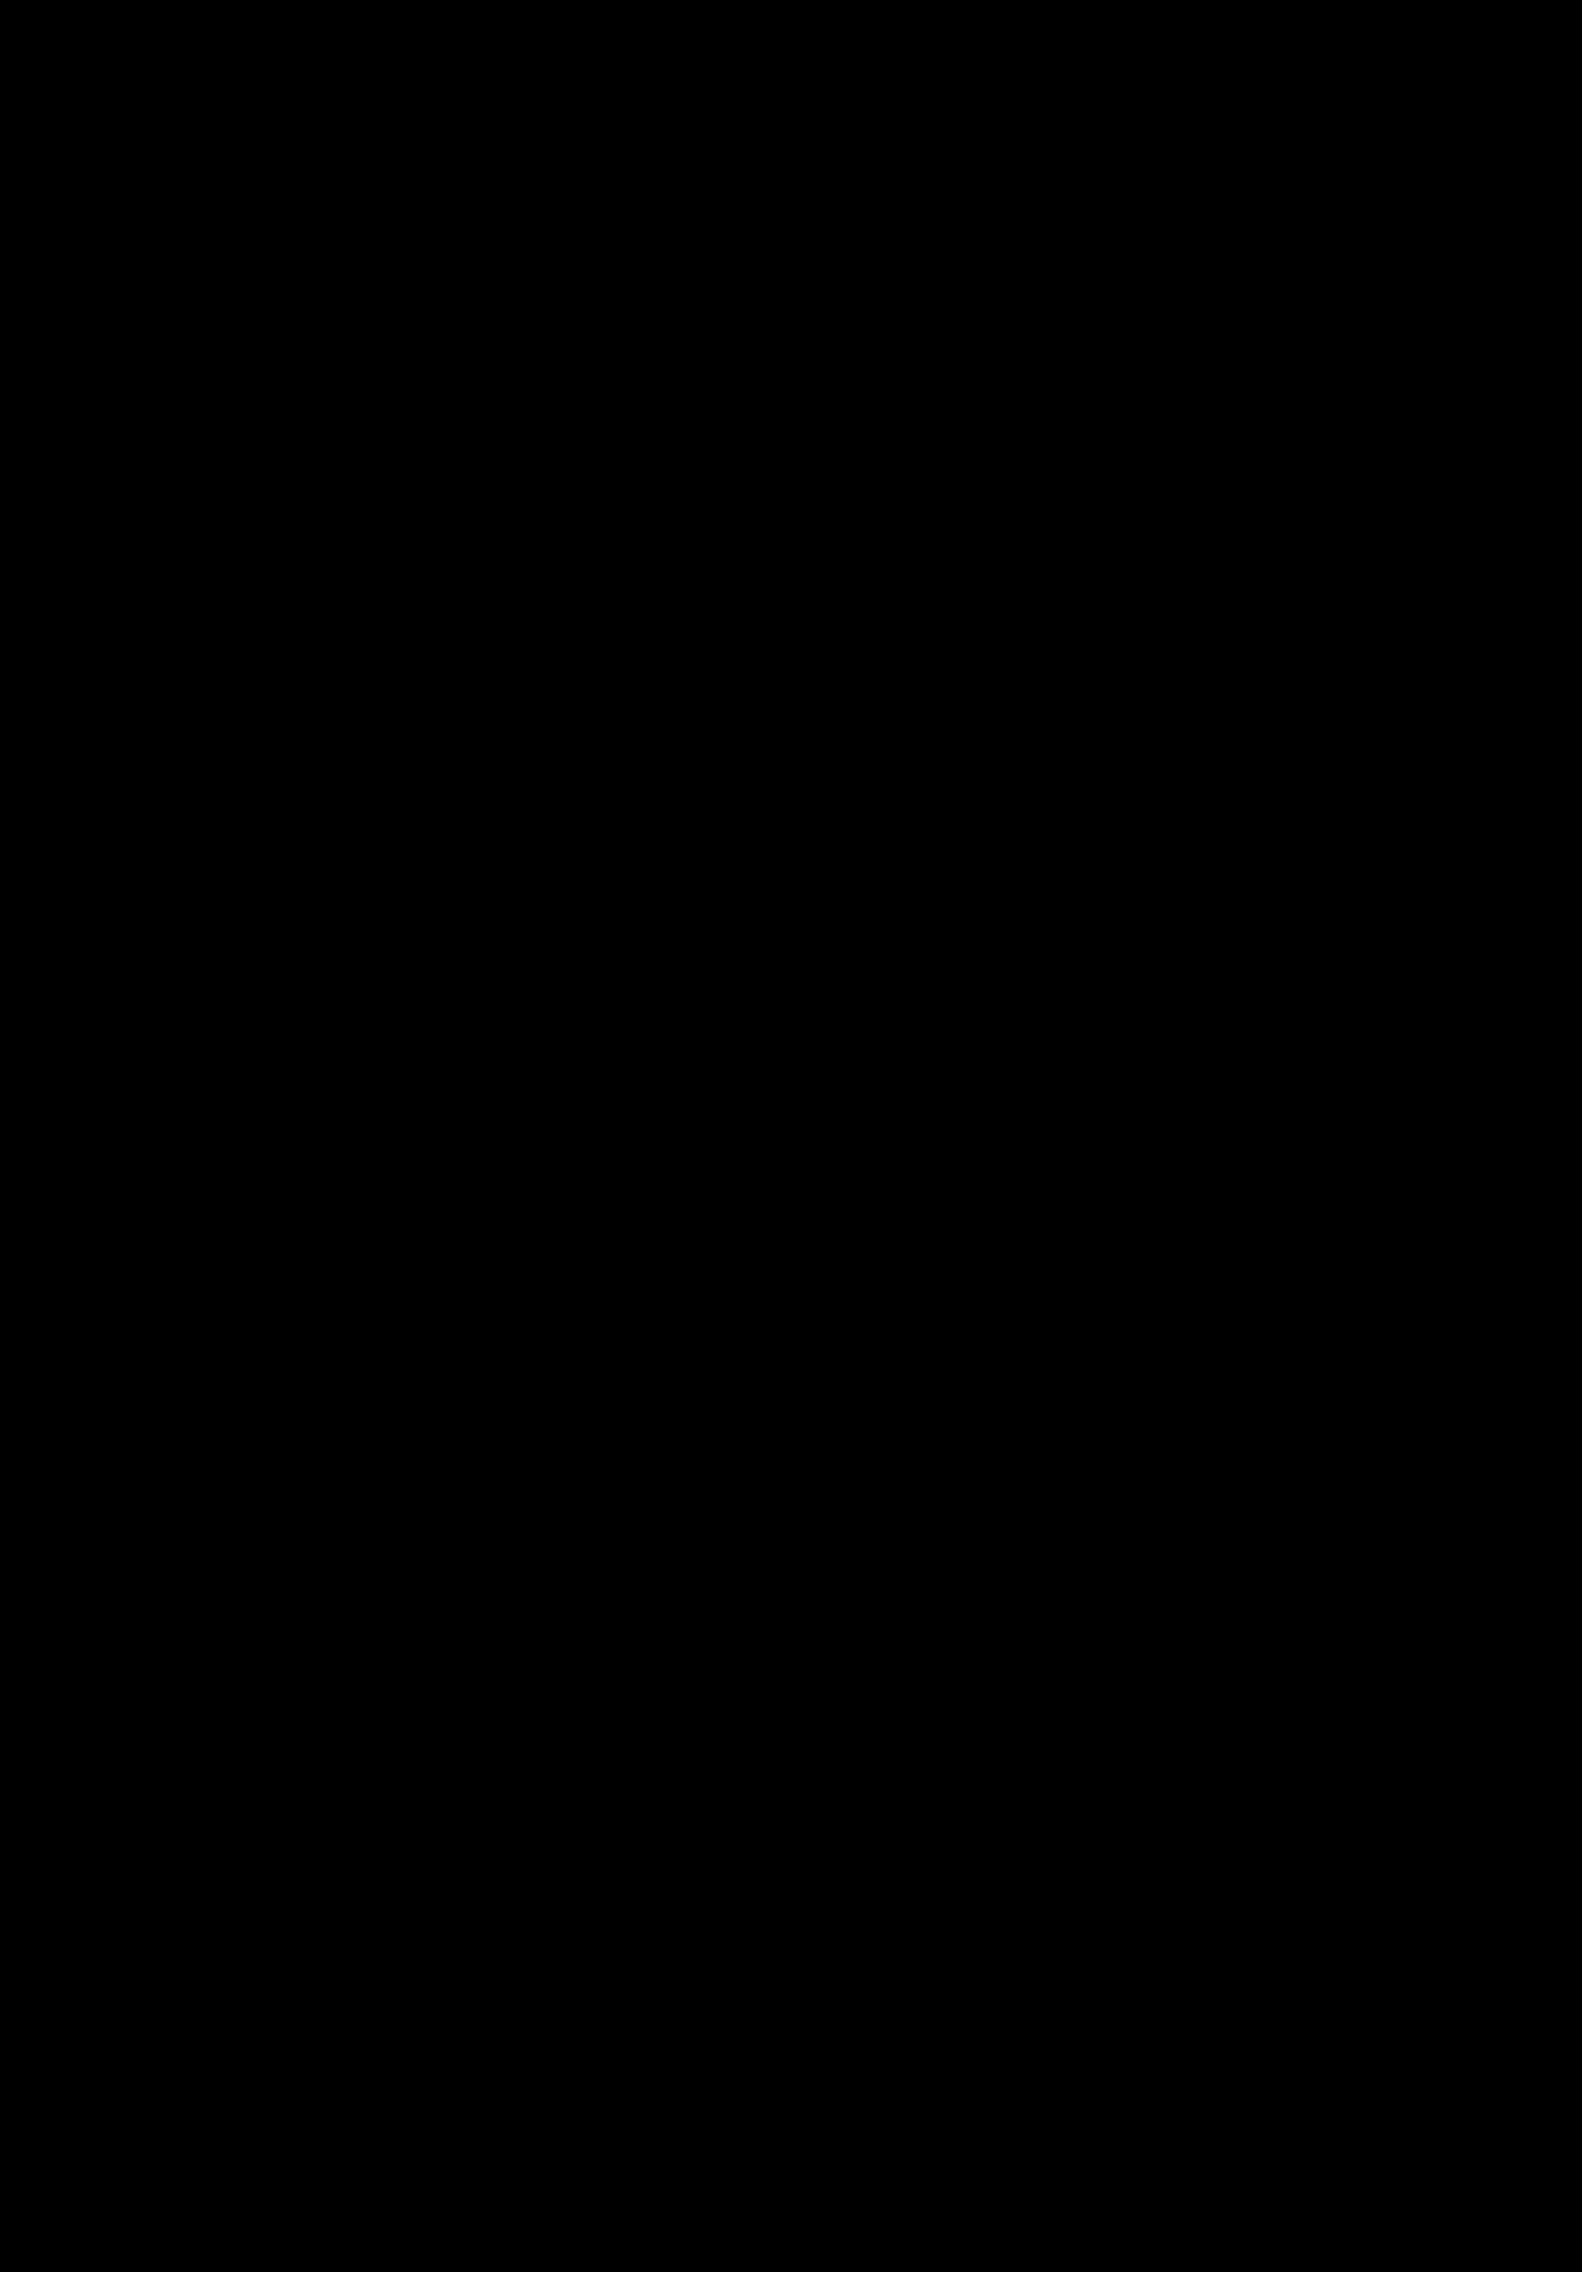 Line art big image. Microscope clipart black and white